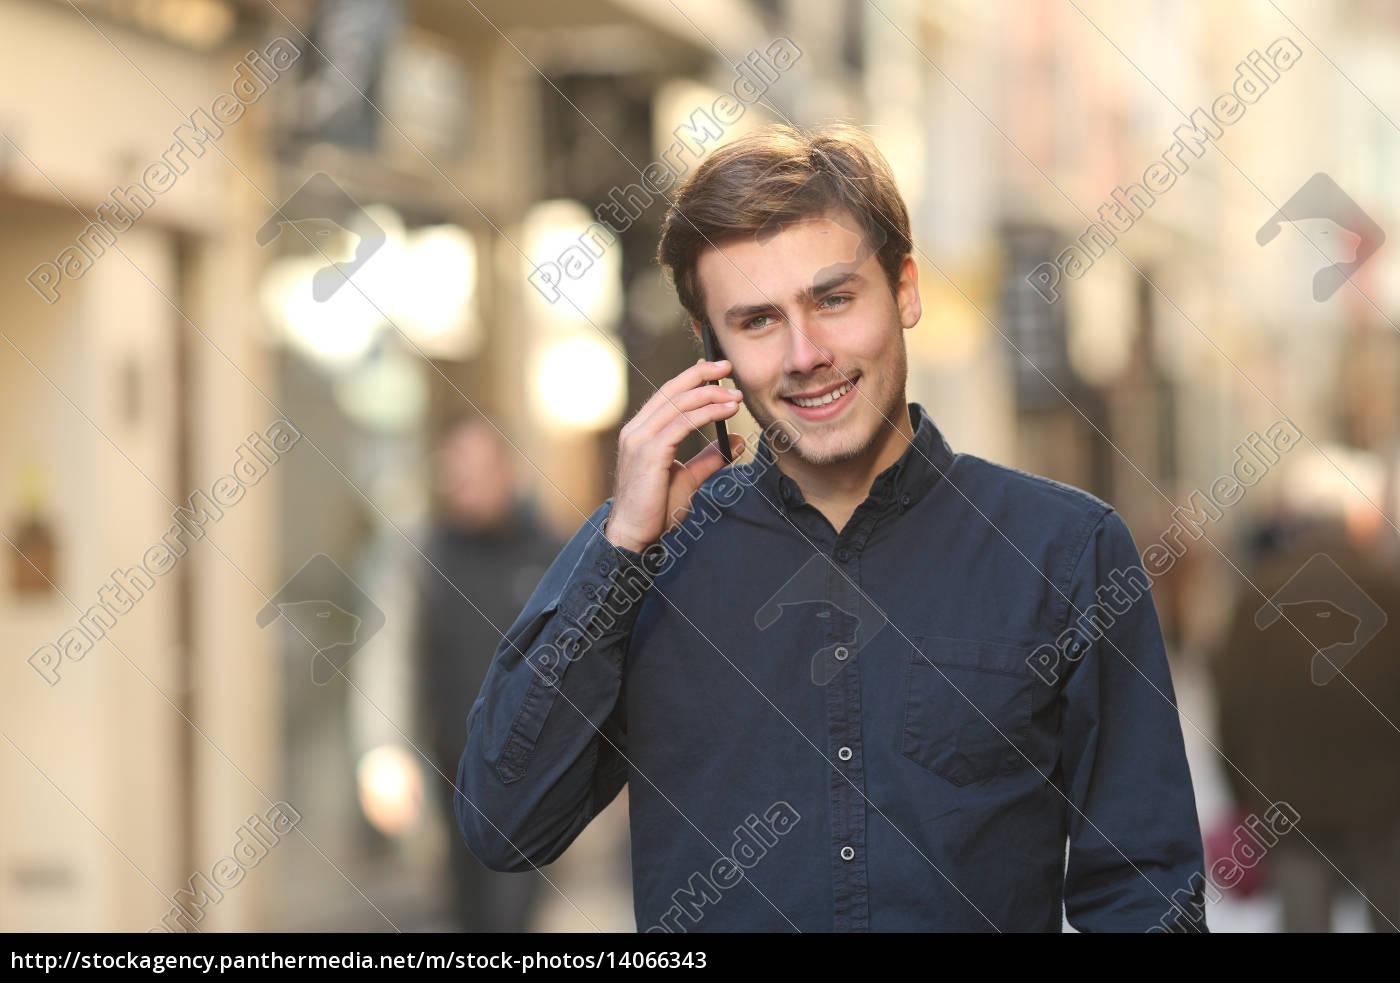 man, calling, on, the, phone, walking - 14066343